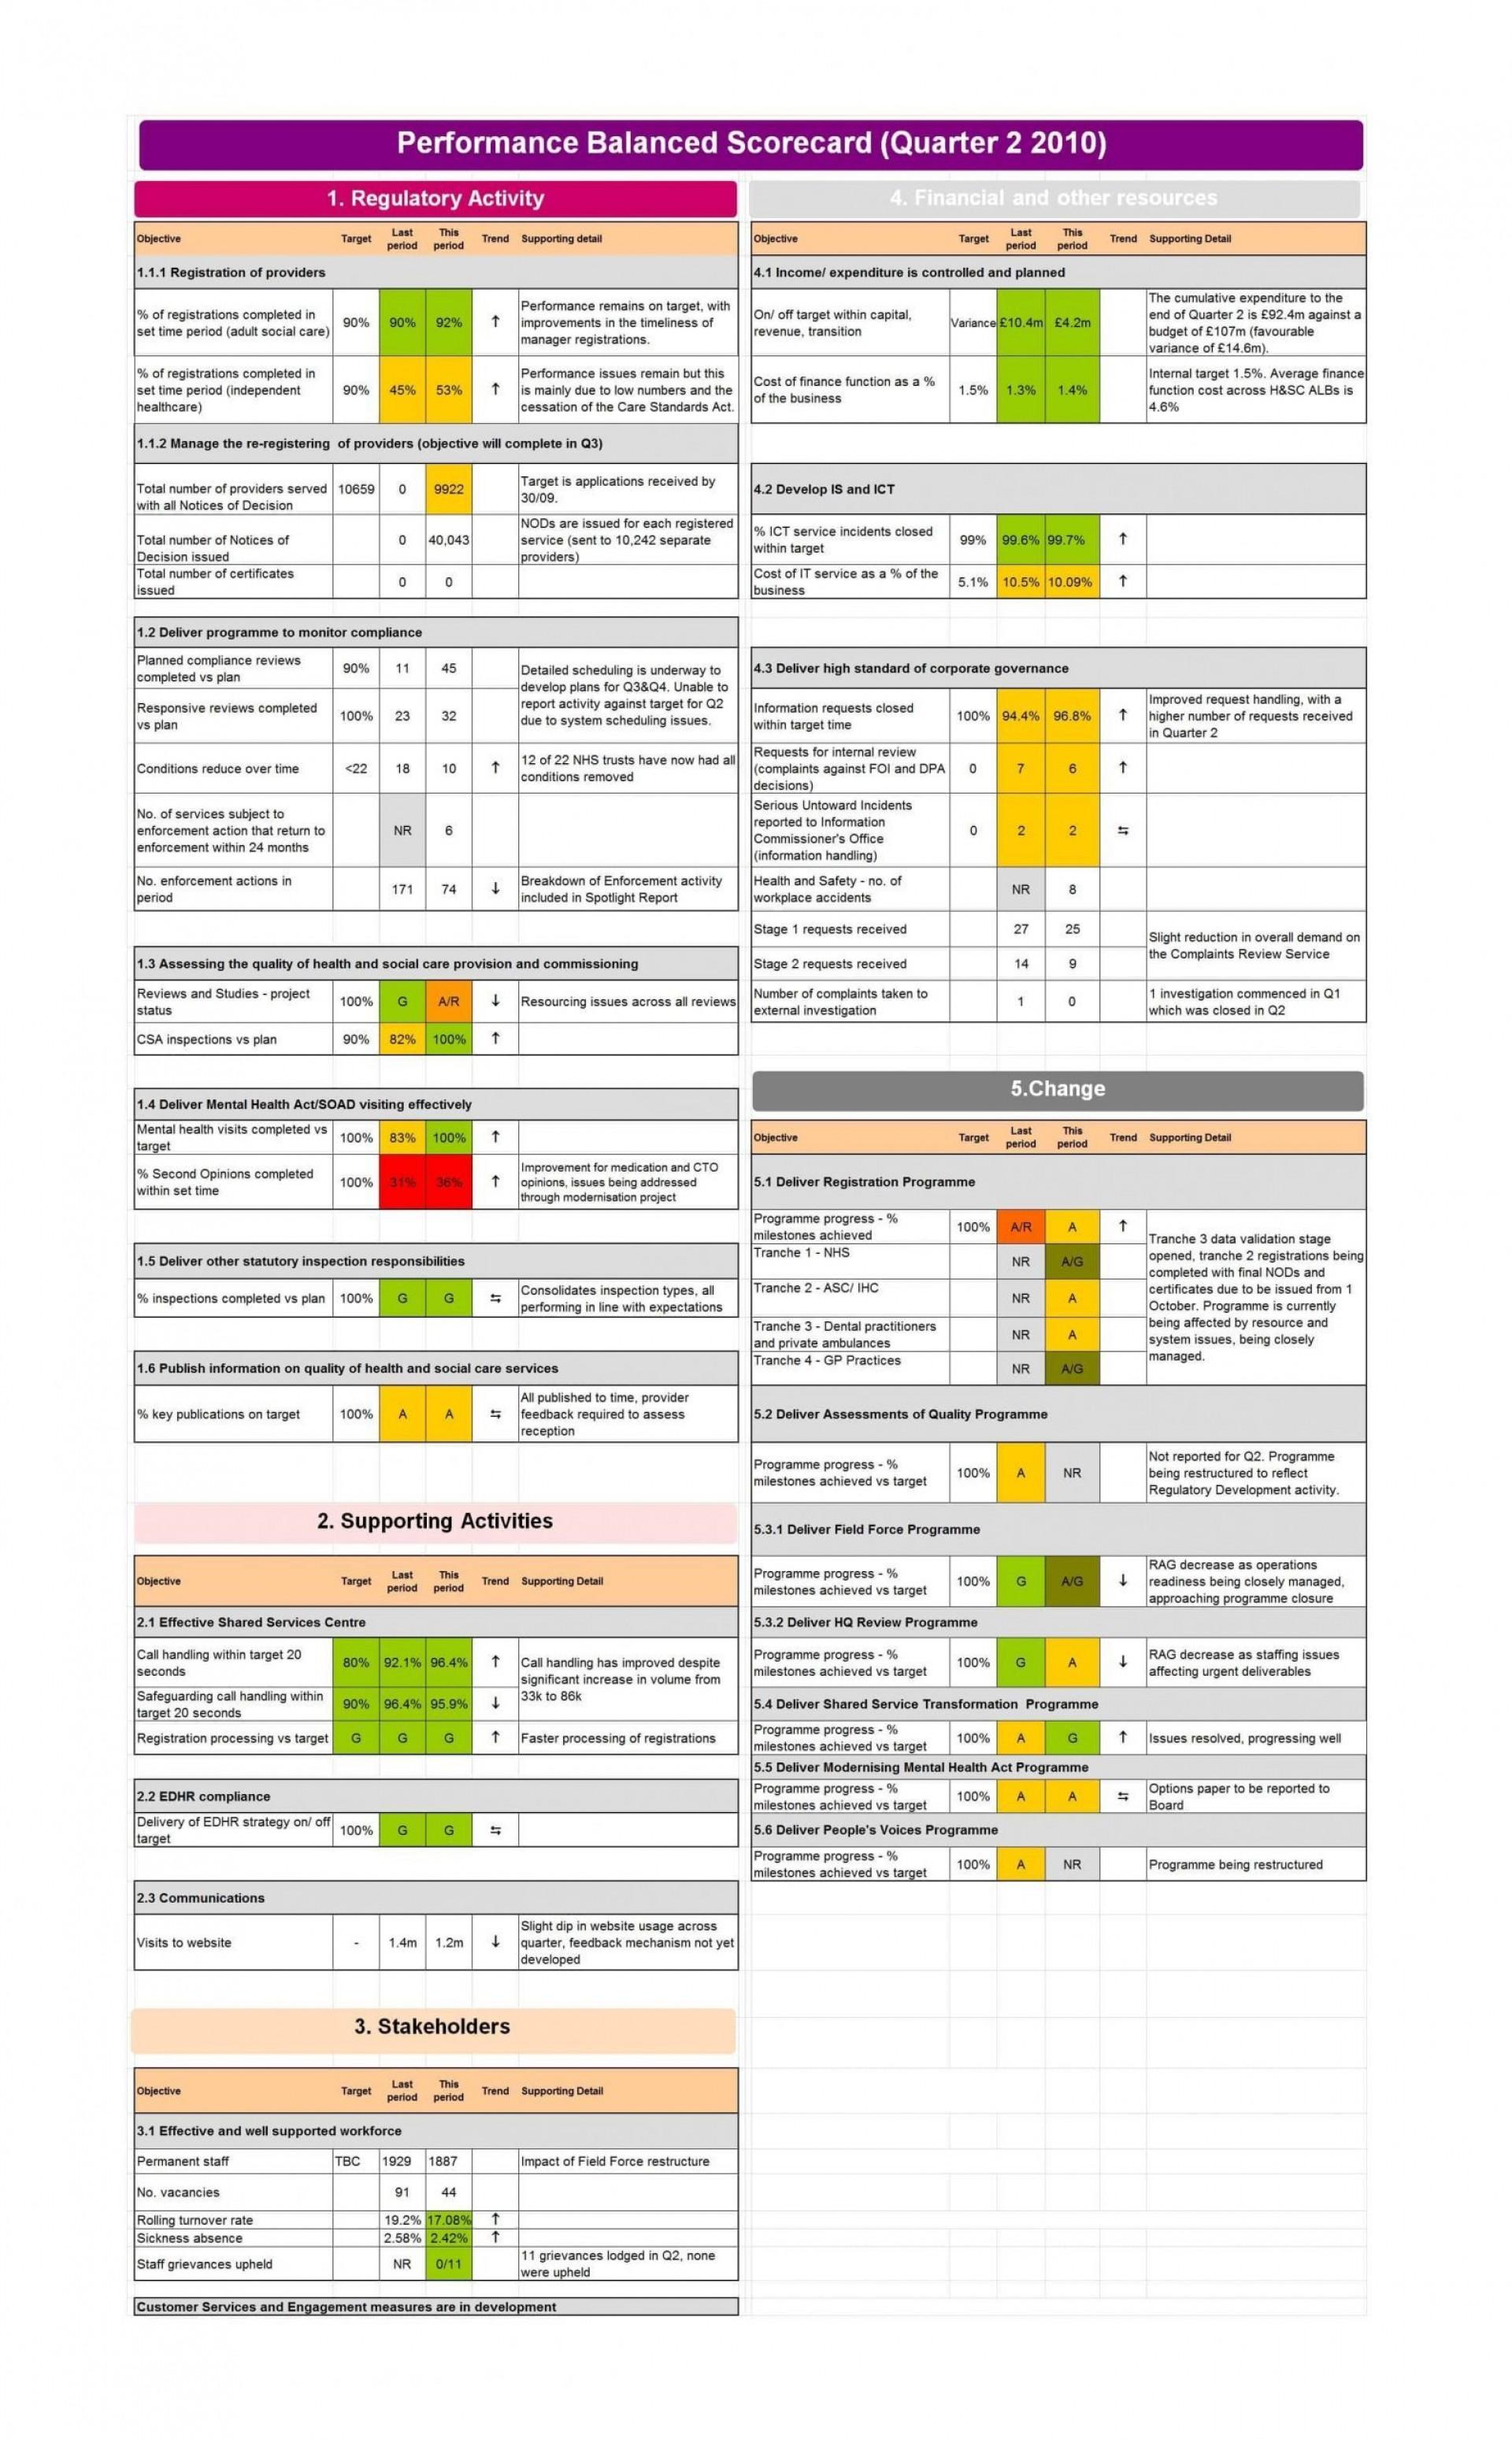 007 Shocking Score Nonprofit Busines Plan Template Highest Clarity 1920